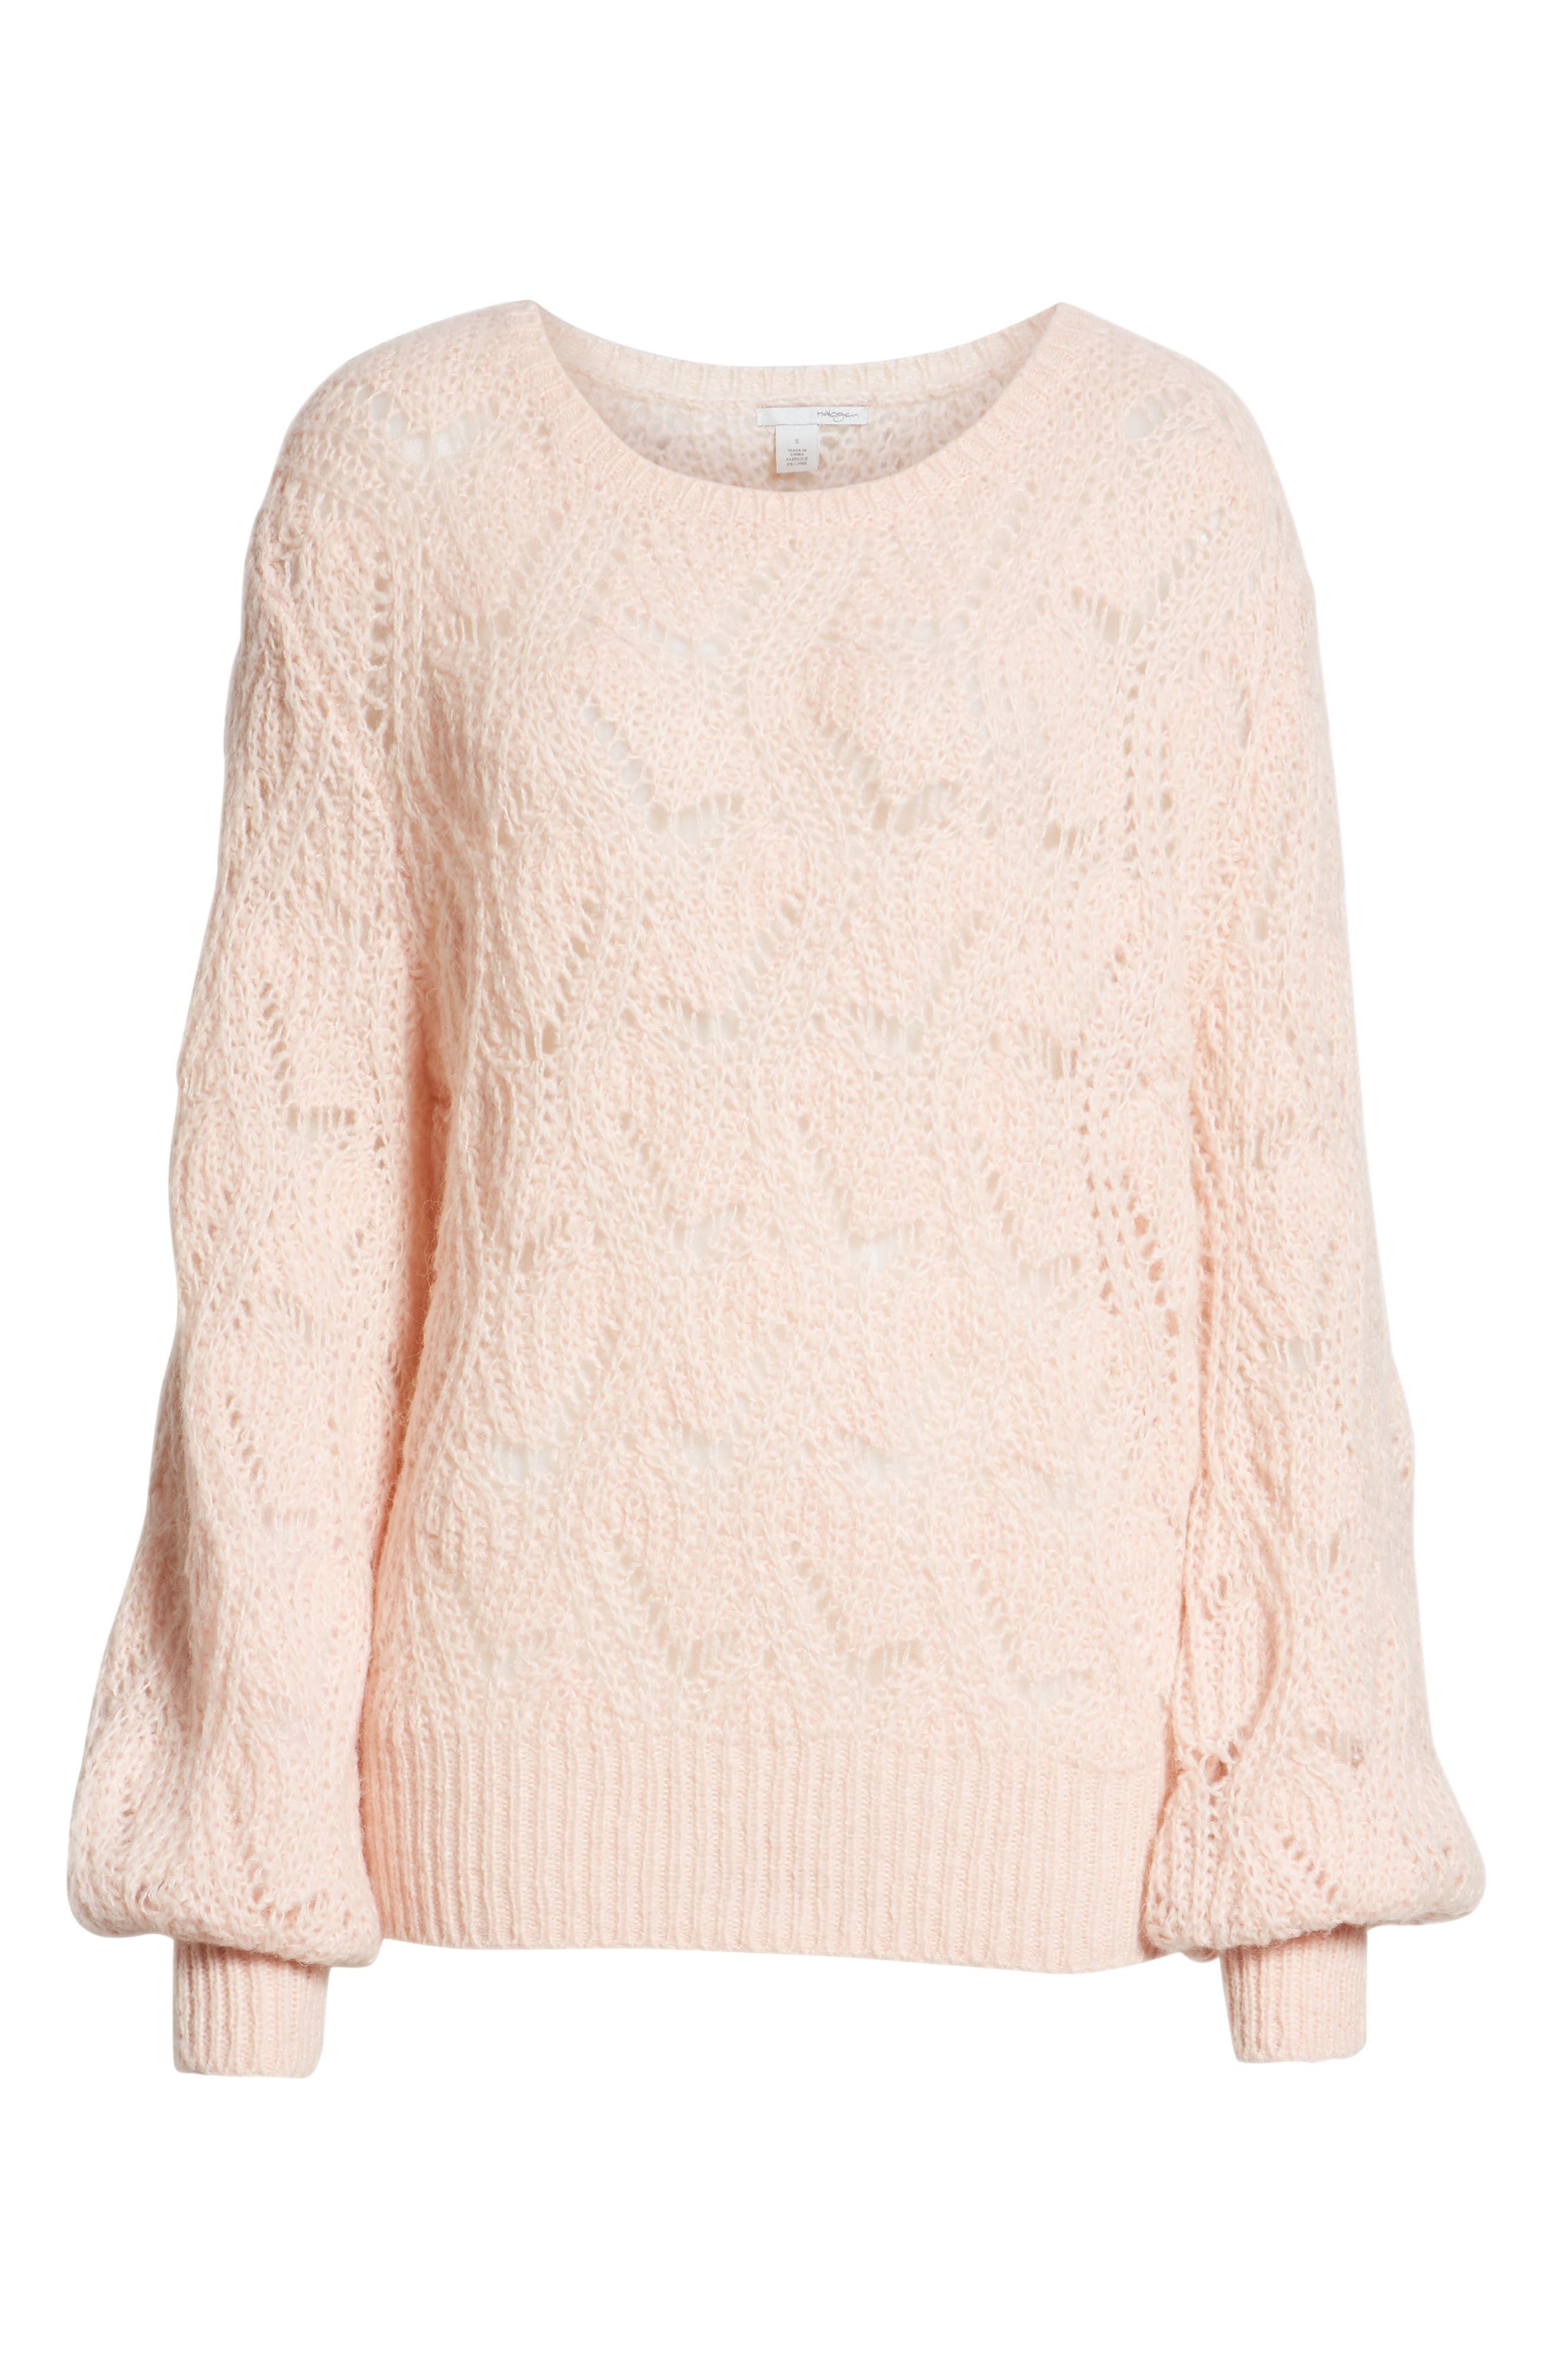 Pointelle Balloon Sleeve Sweater,                             Alternate thumbnail 6, color,                             PINK SMOKE